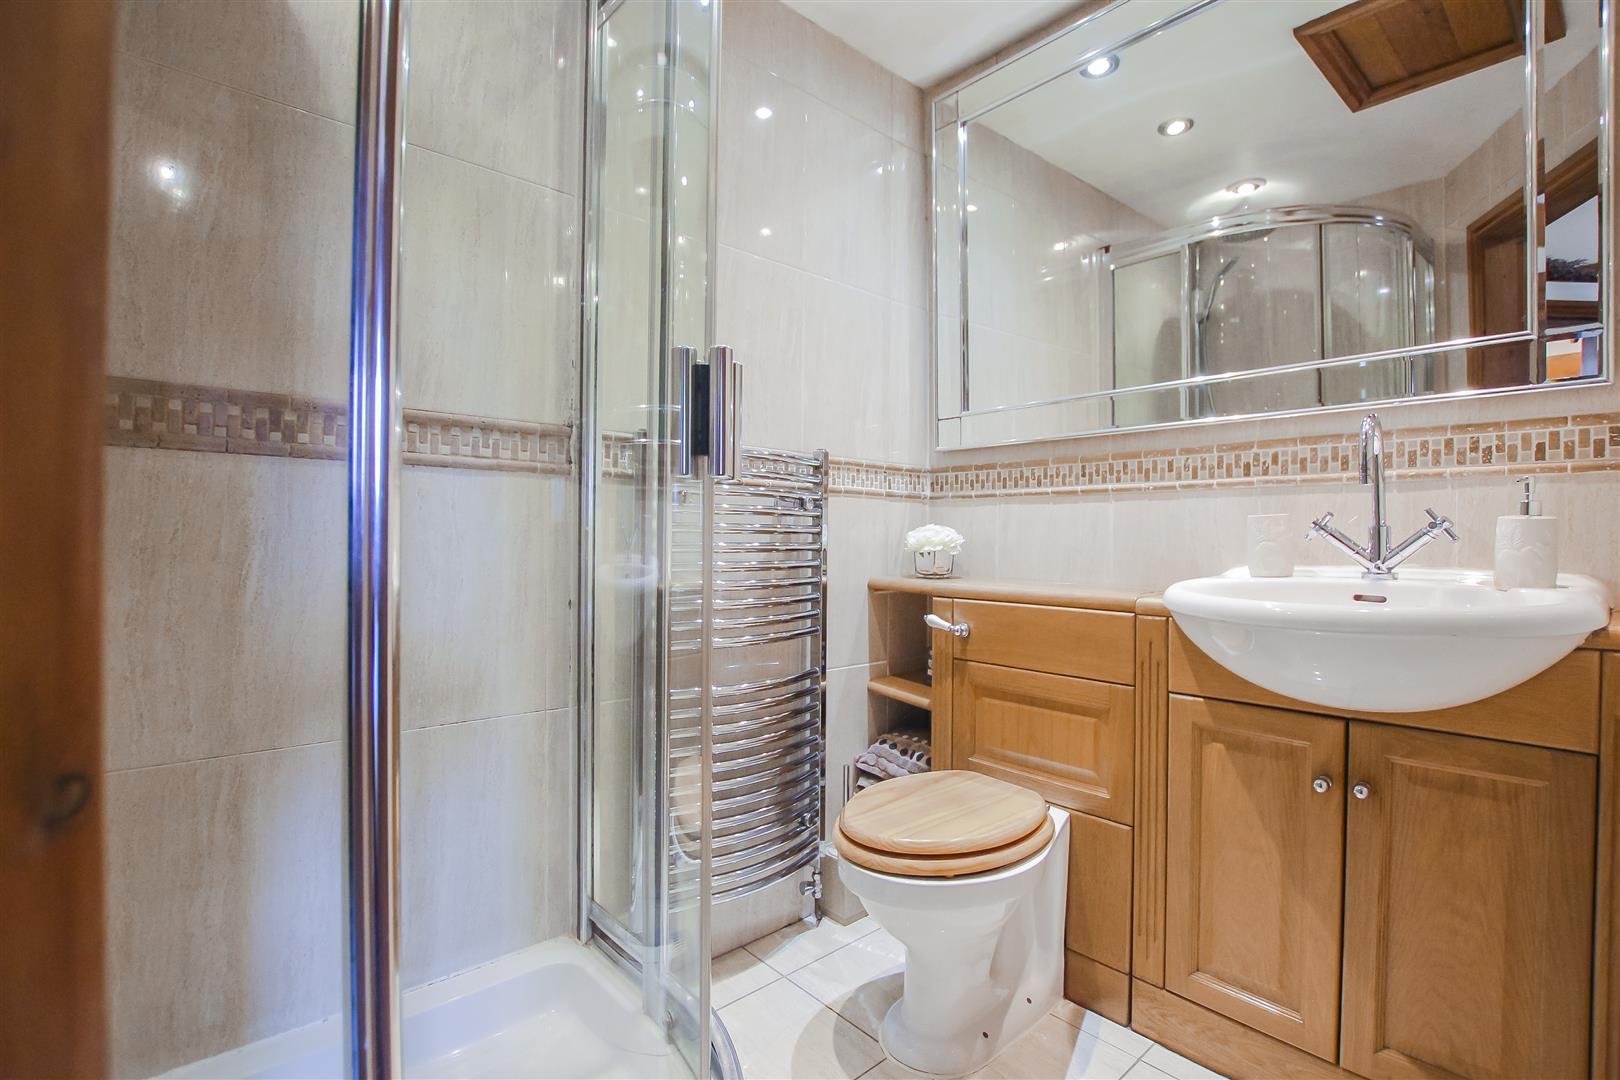 4 Bedroom Semi-detached House For Sale - Image 23